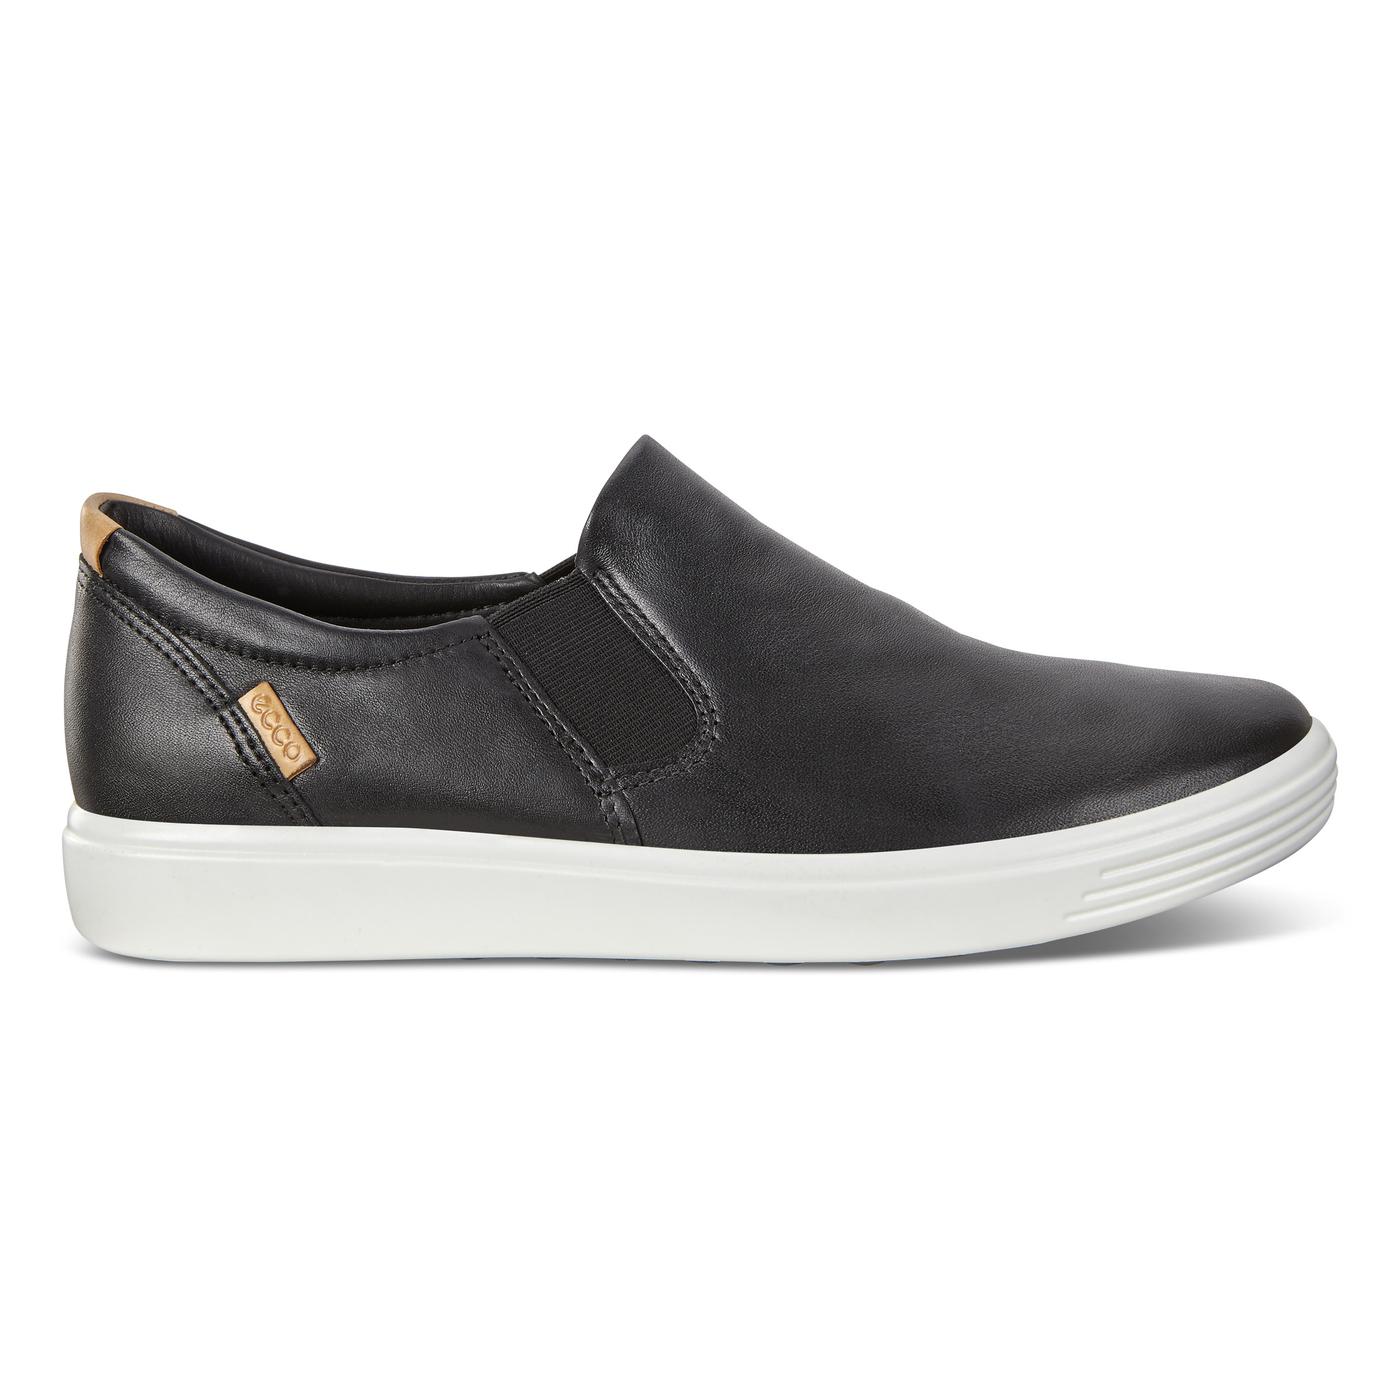 ECCO SOFT7 Womens Sneaker Slip-On